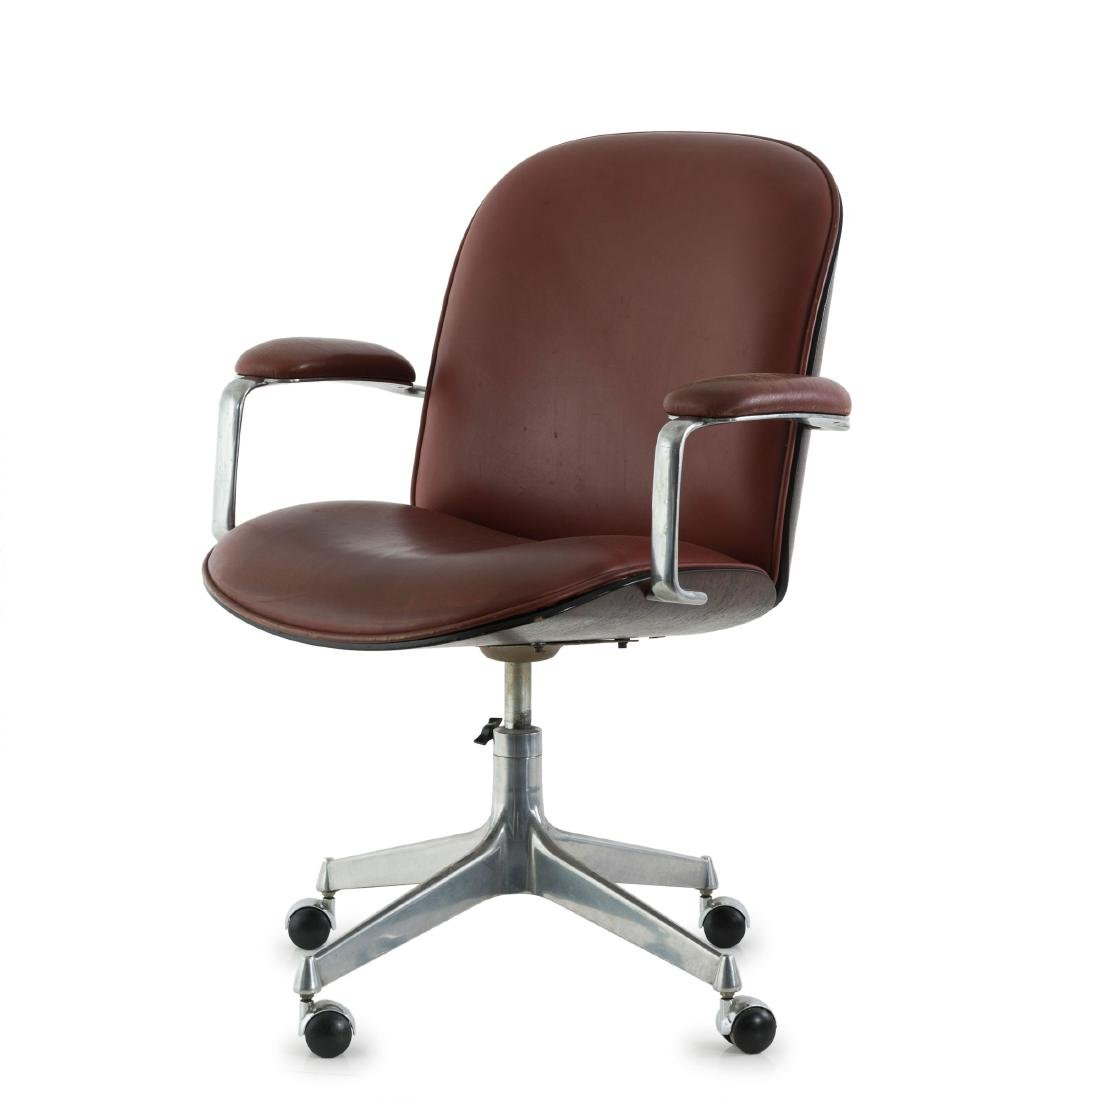 Desk armchair, 1959/60